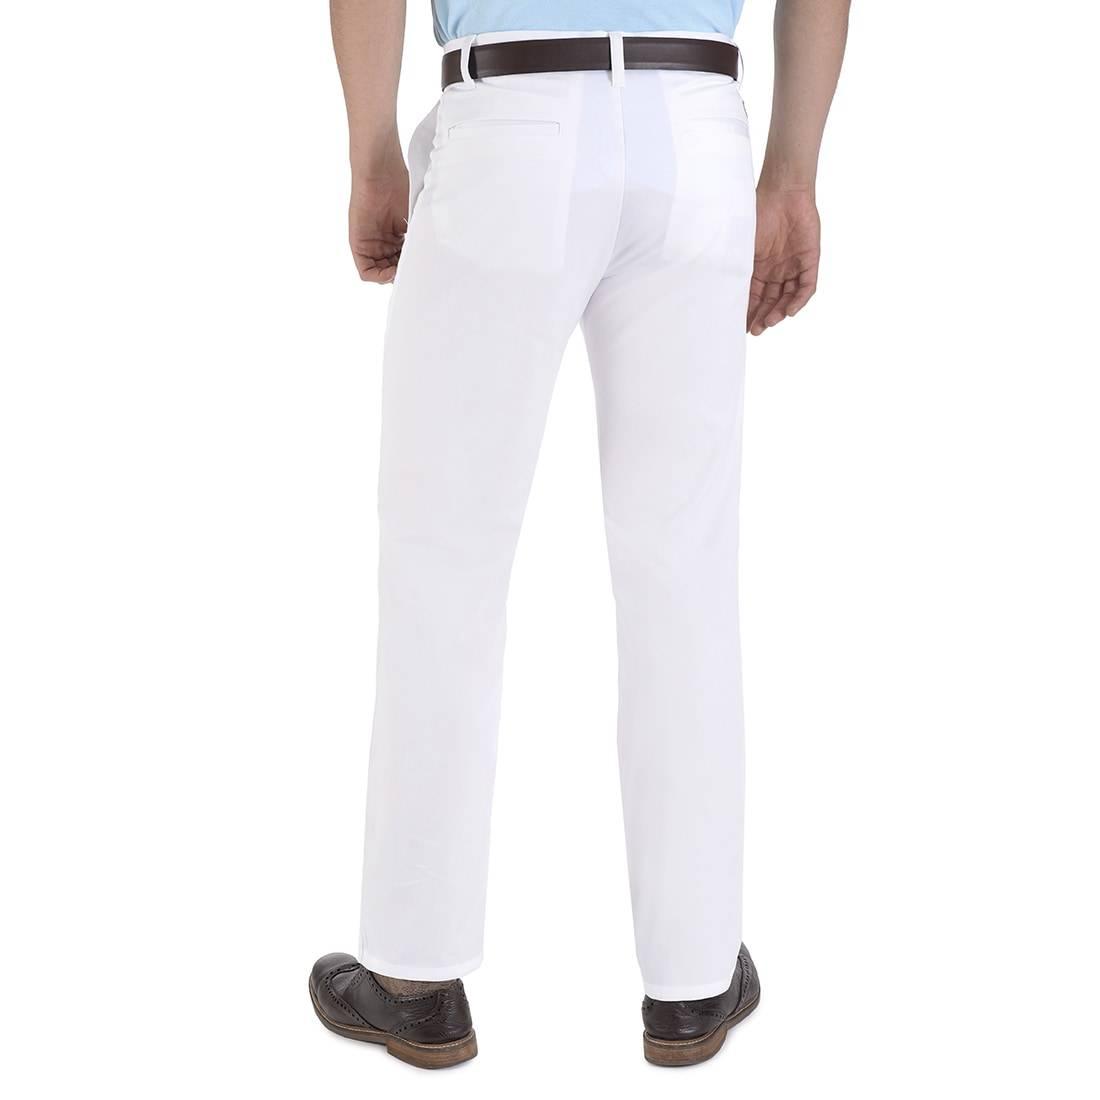 010920418902-02-Pantalon-Casual-Slim-Fit-Blanco-yale